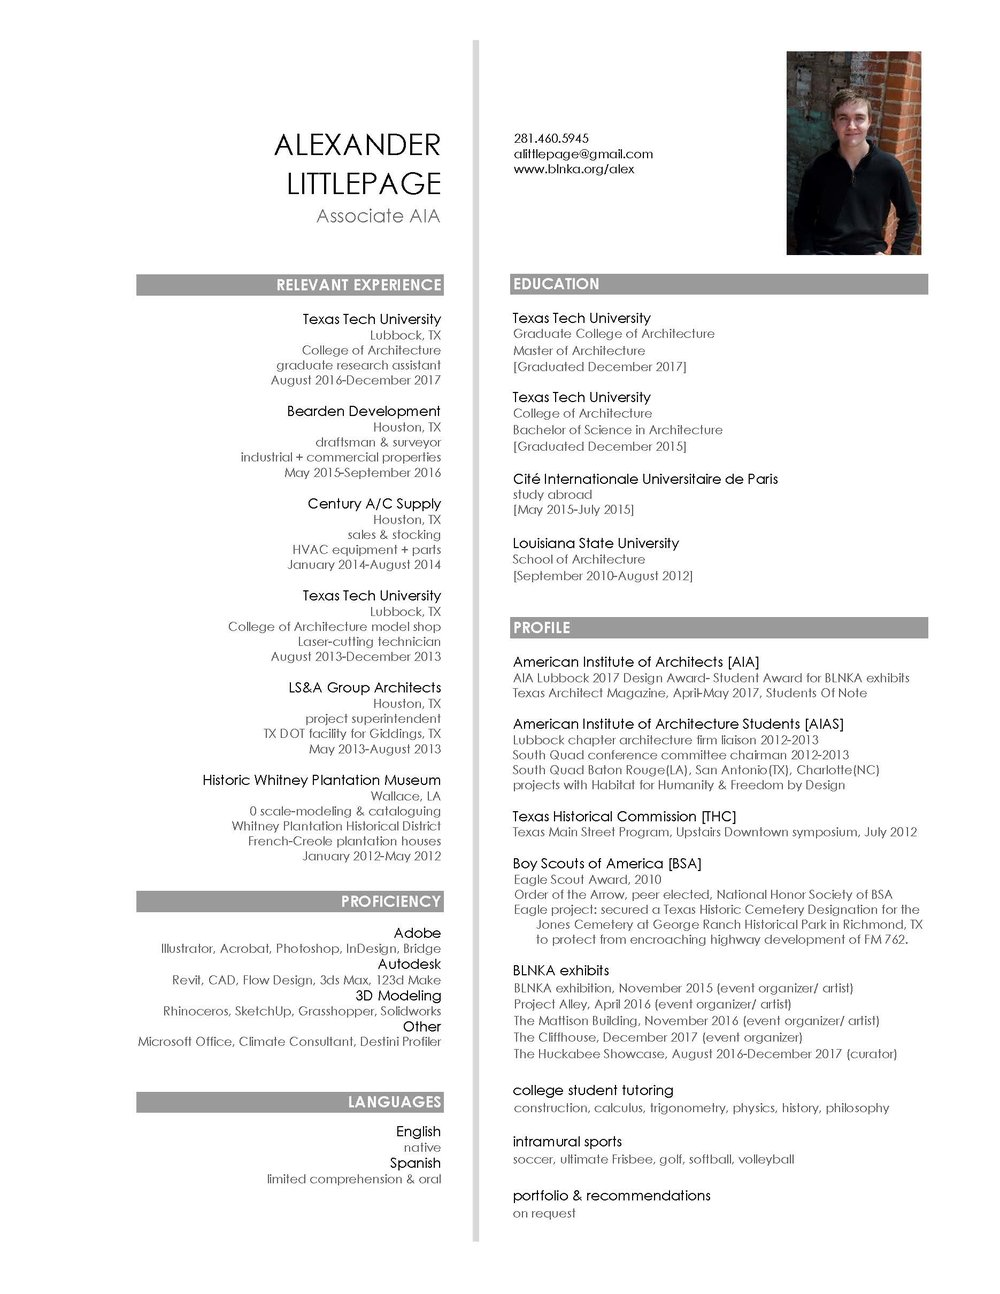 Littlepage, Alexander_Resume_1.14.18.jpg